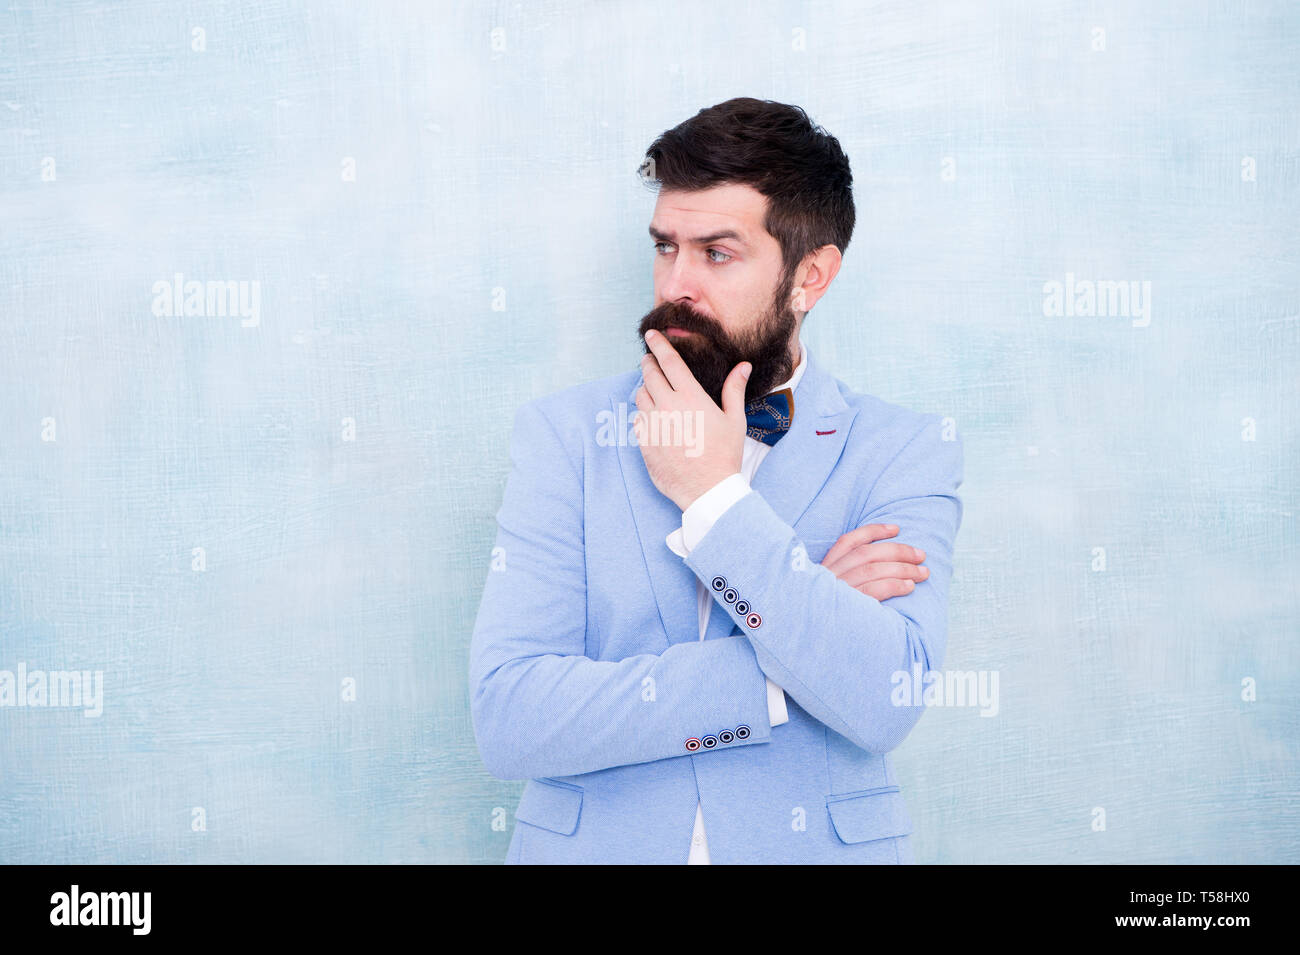 Hipster Matrimonio Uomo : Wedding day nerves immagini & wedding day nerves fotos stock alamy